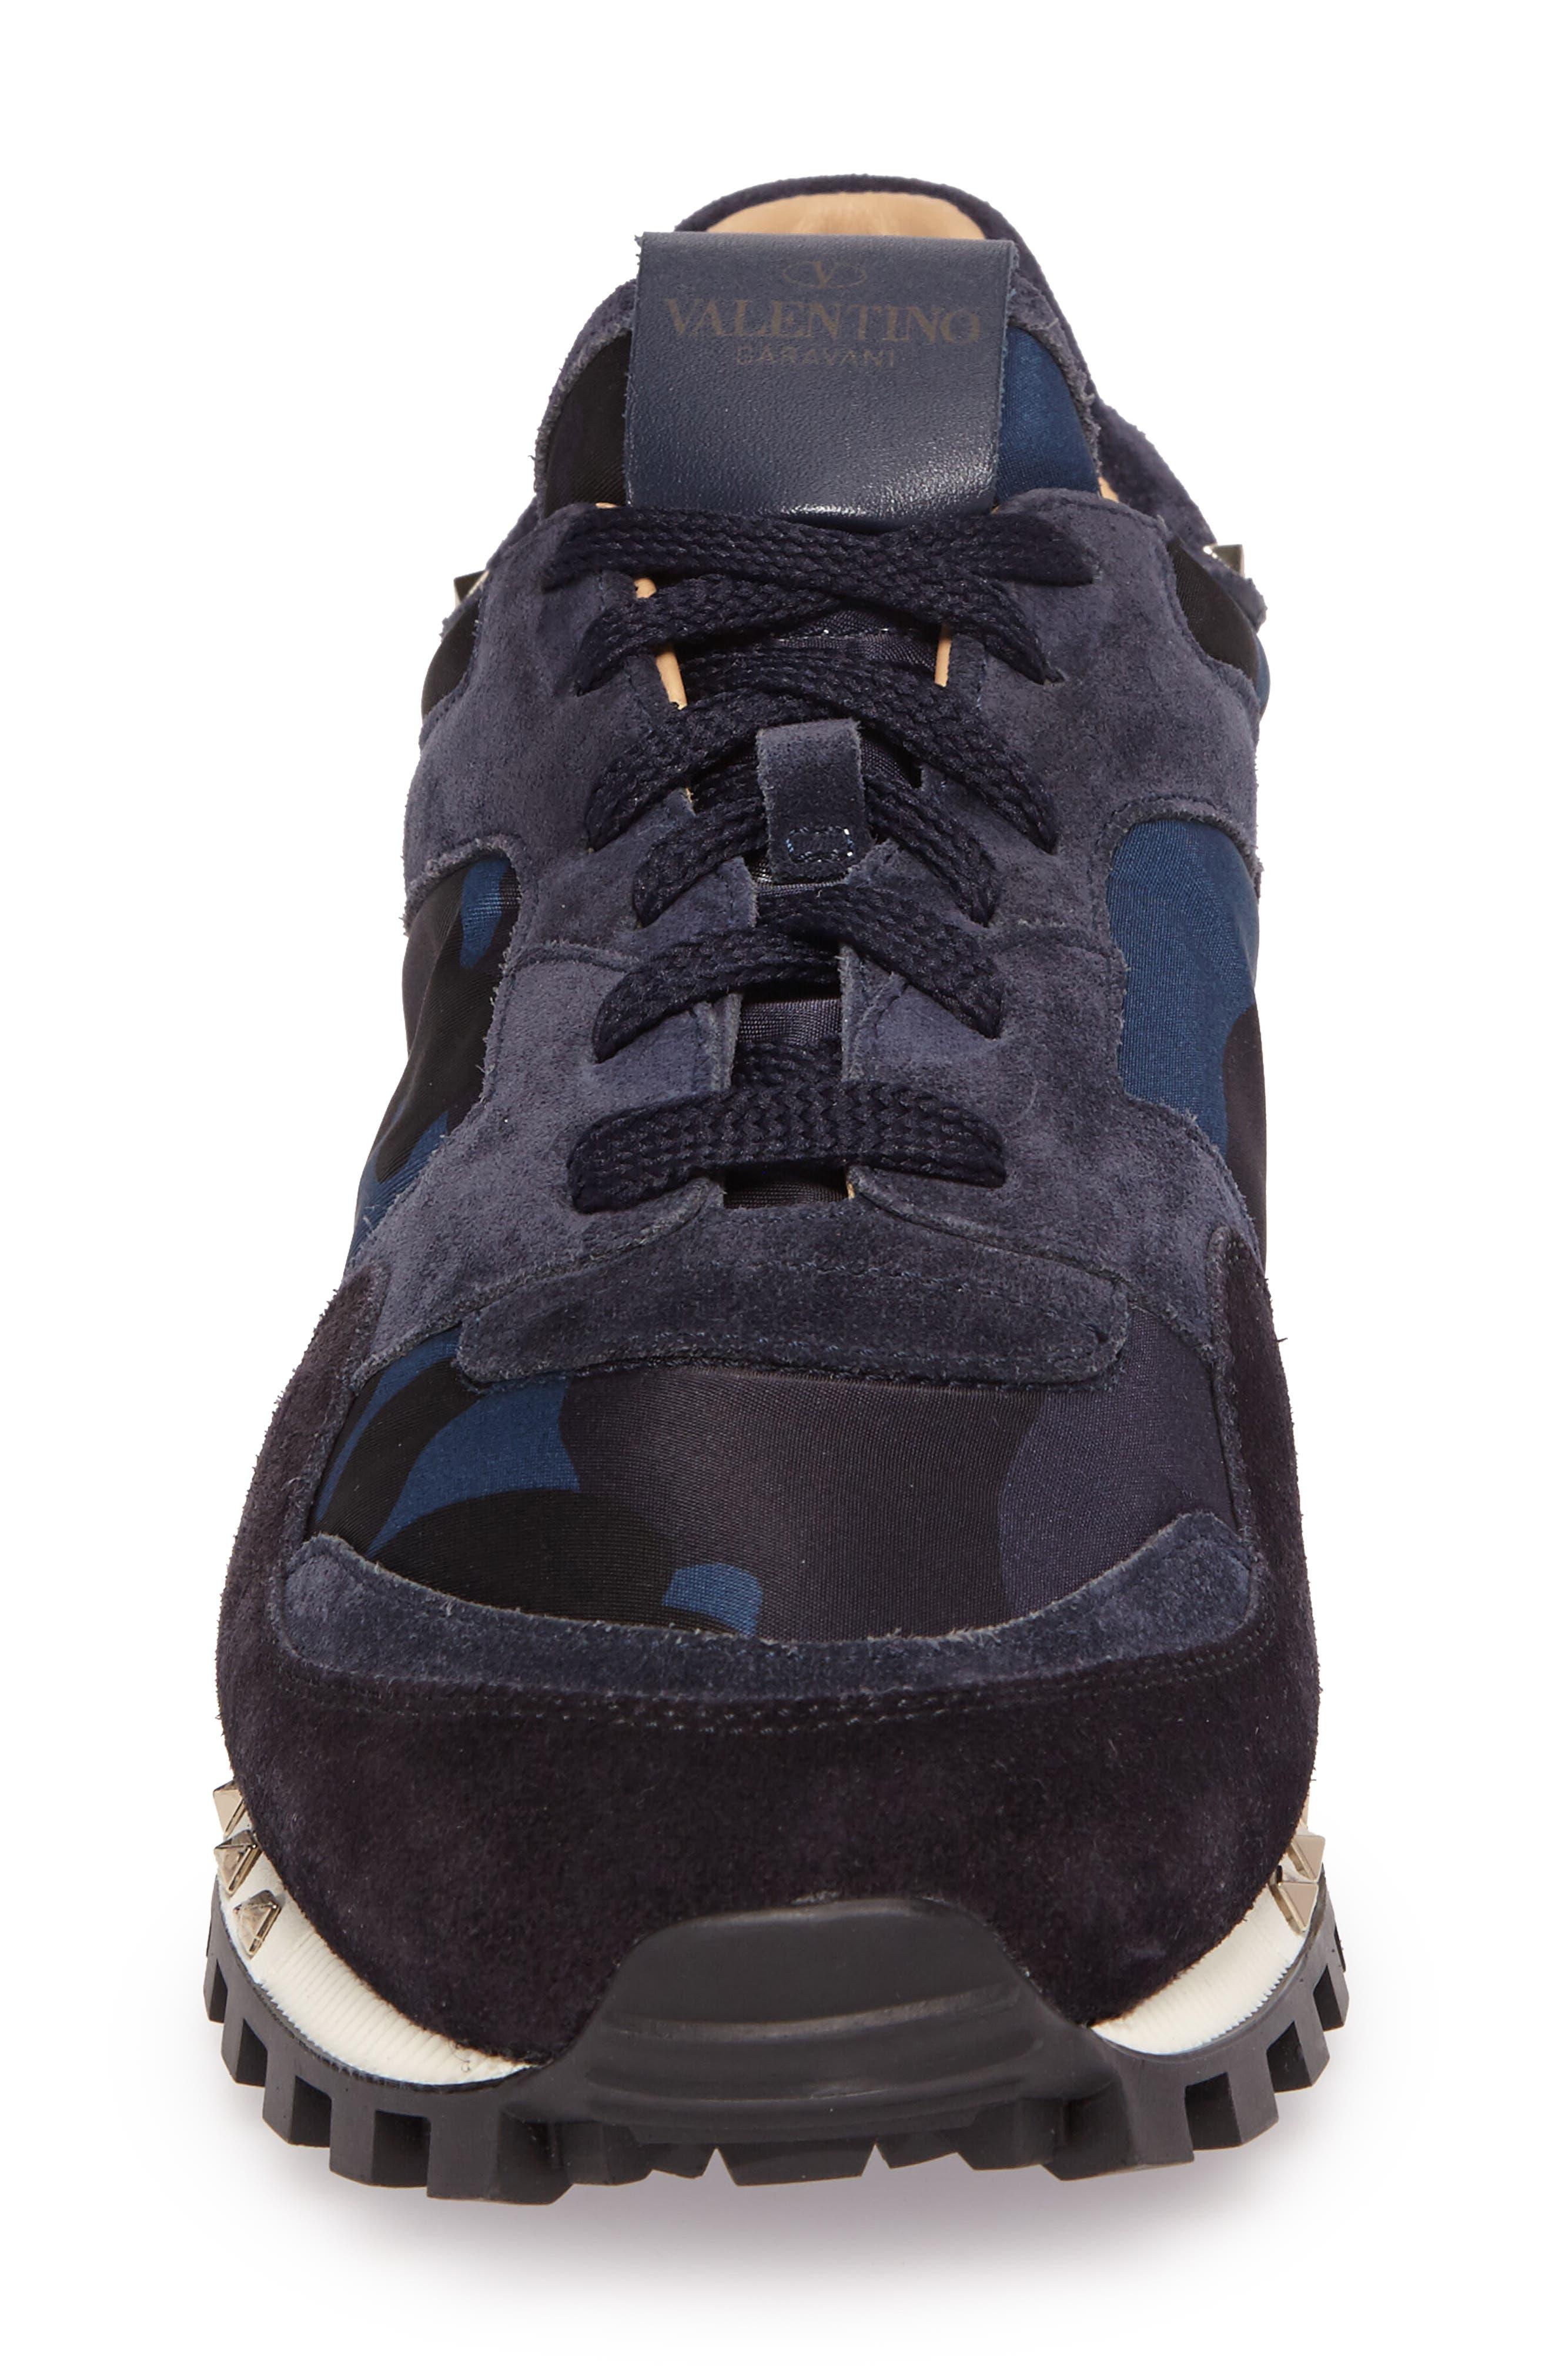 Camo Rockstud Sneaker,                             Alternate thumbnail 4, color,                             Marine/ Nero/ Dark Blue